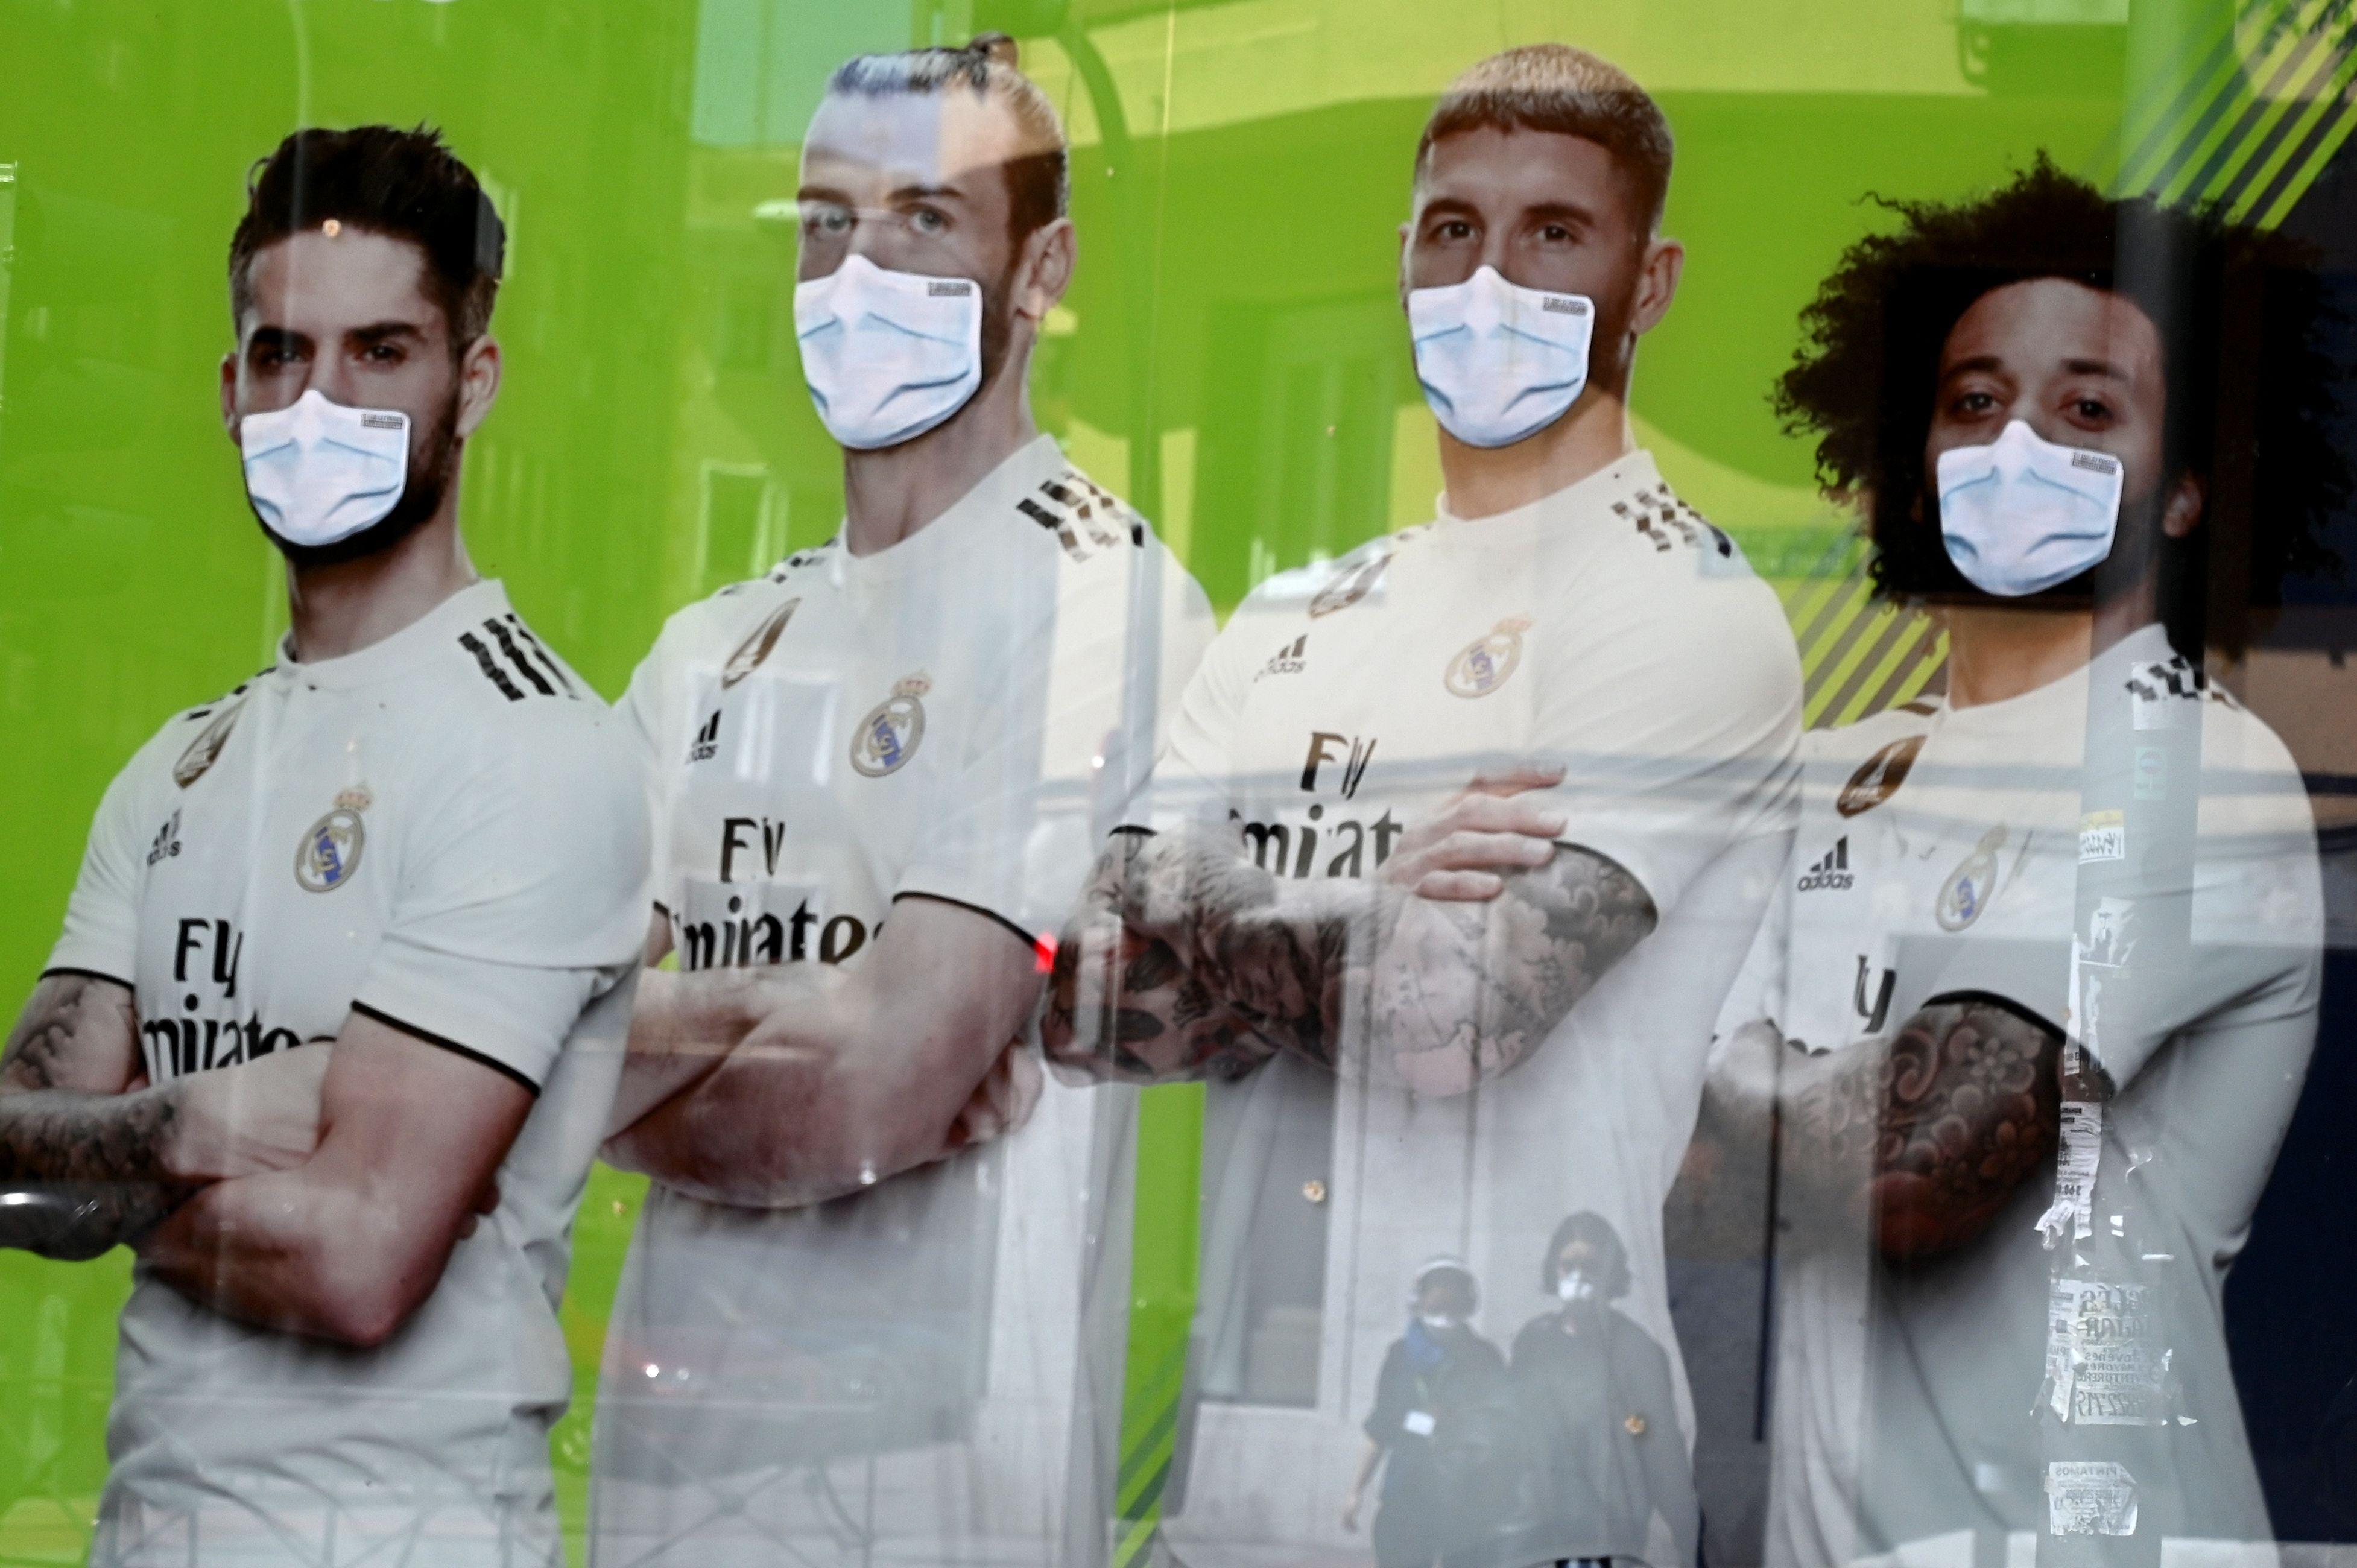 SPAIN-HEALTH-VIRUS-FBL